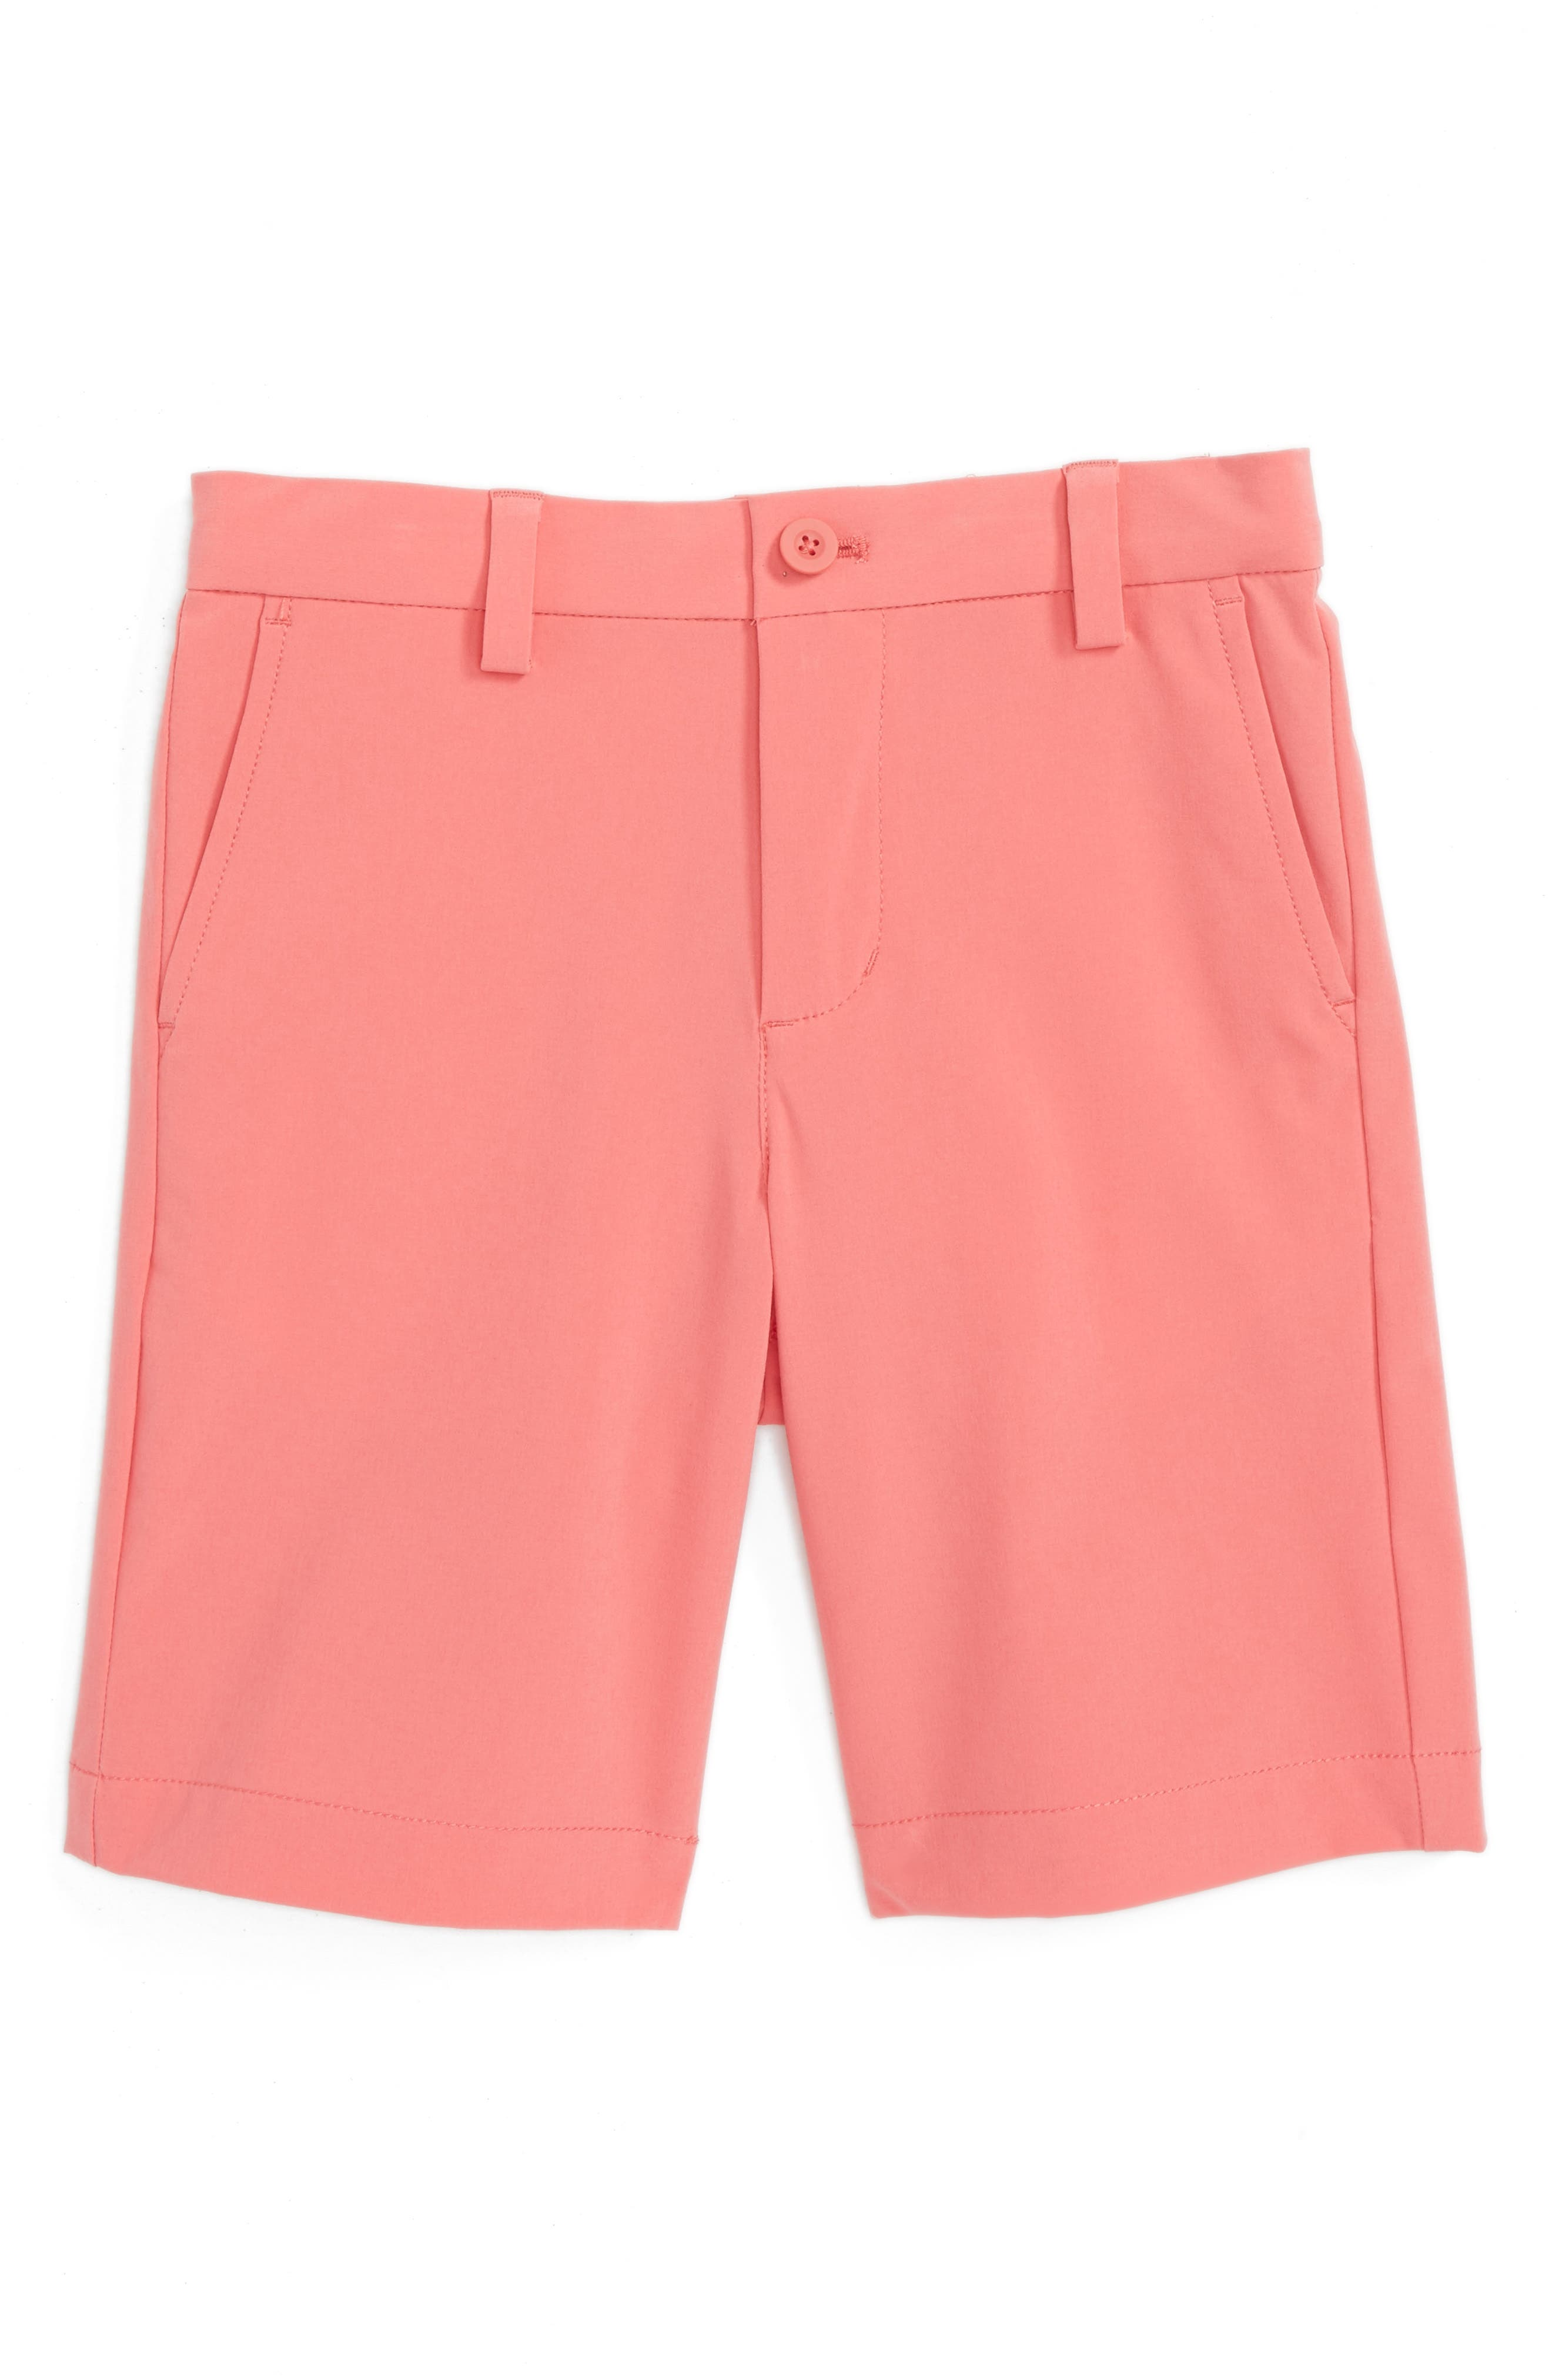 VINEYARD VINES Breaker Hybrid Shorts